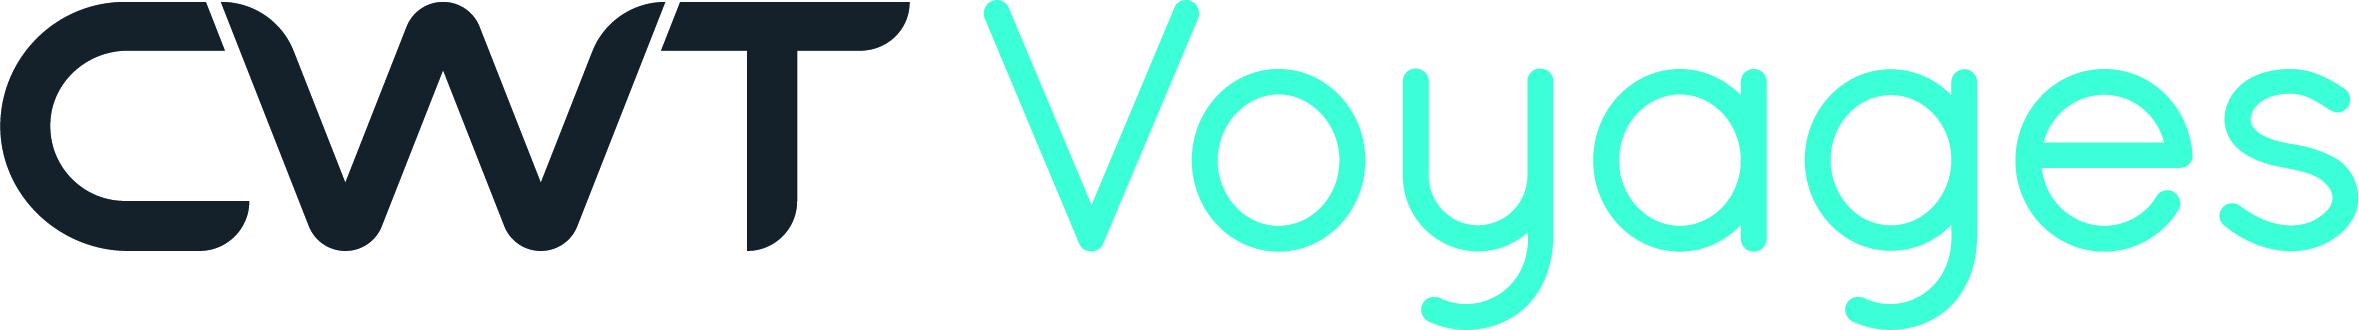 CWT Voyages Logo - FR